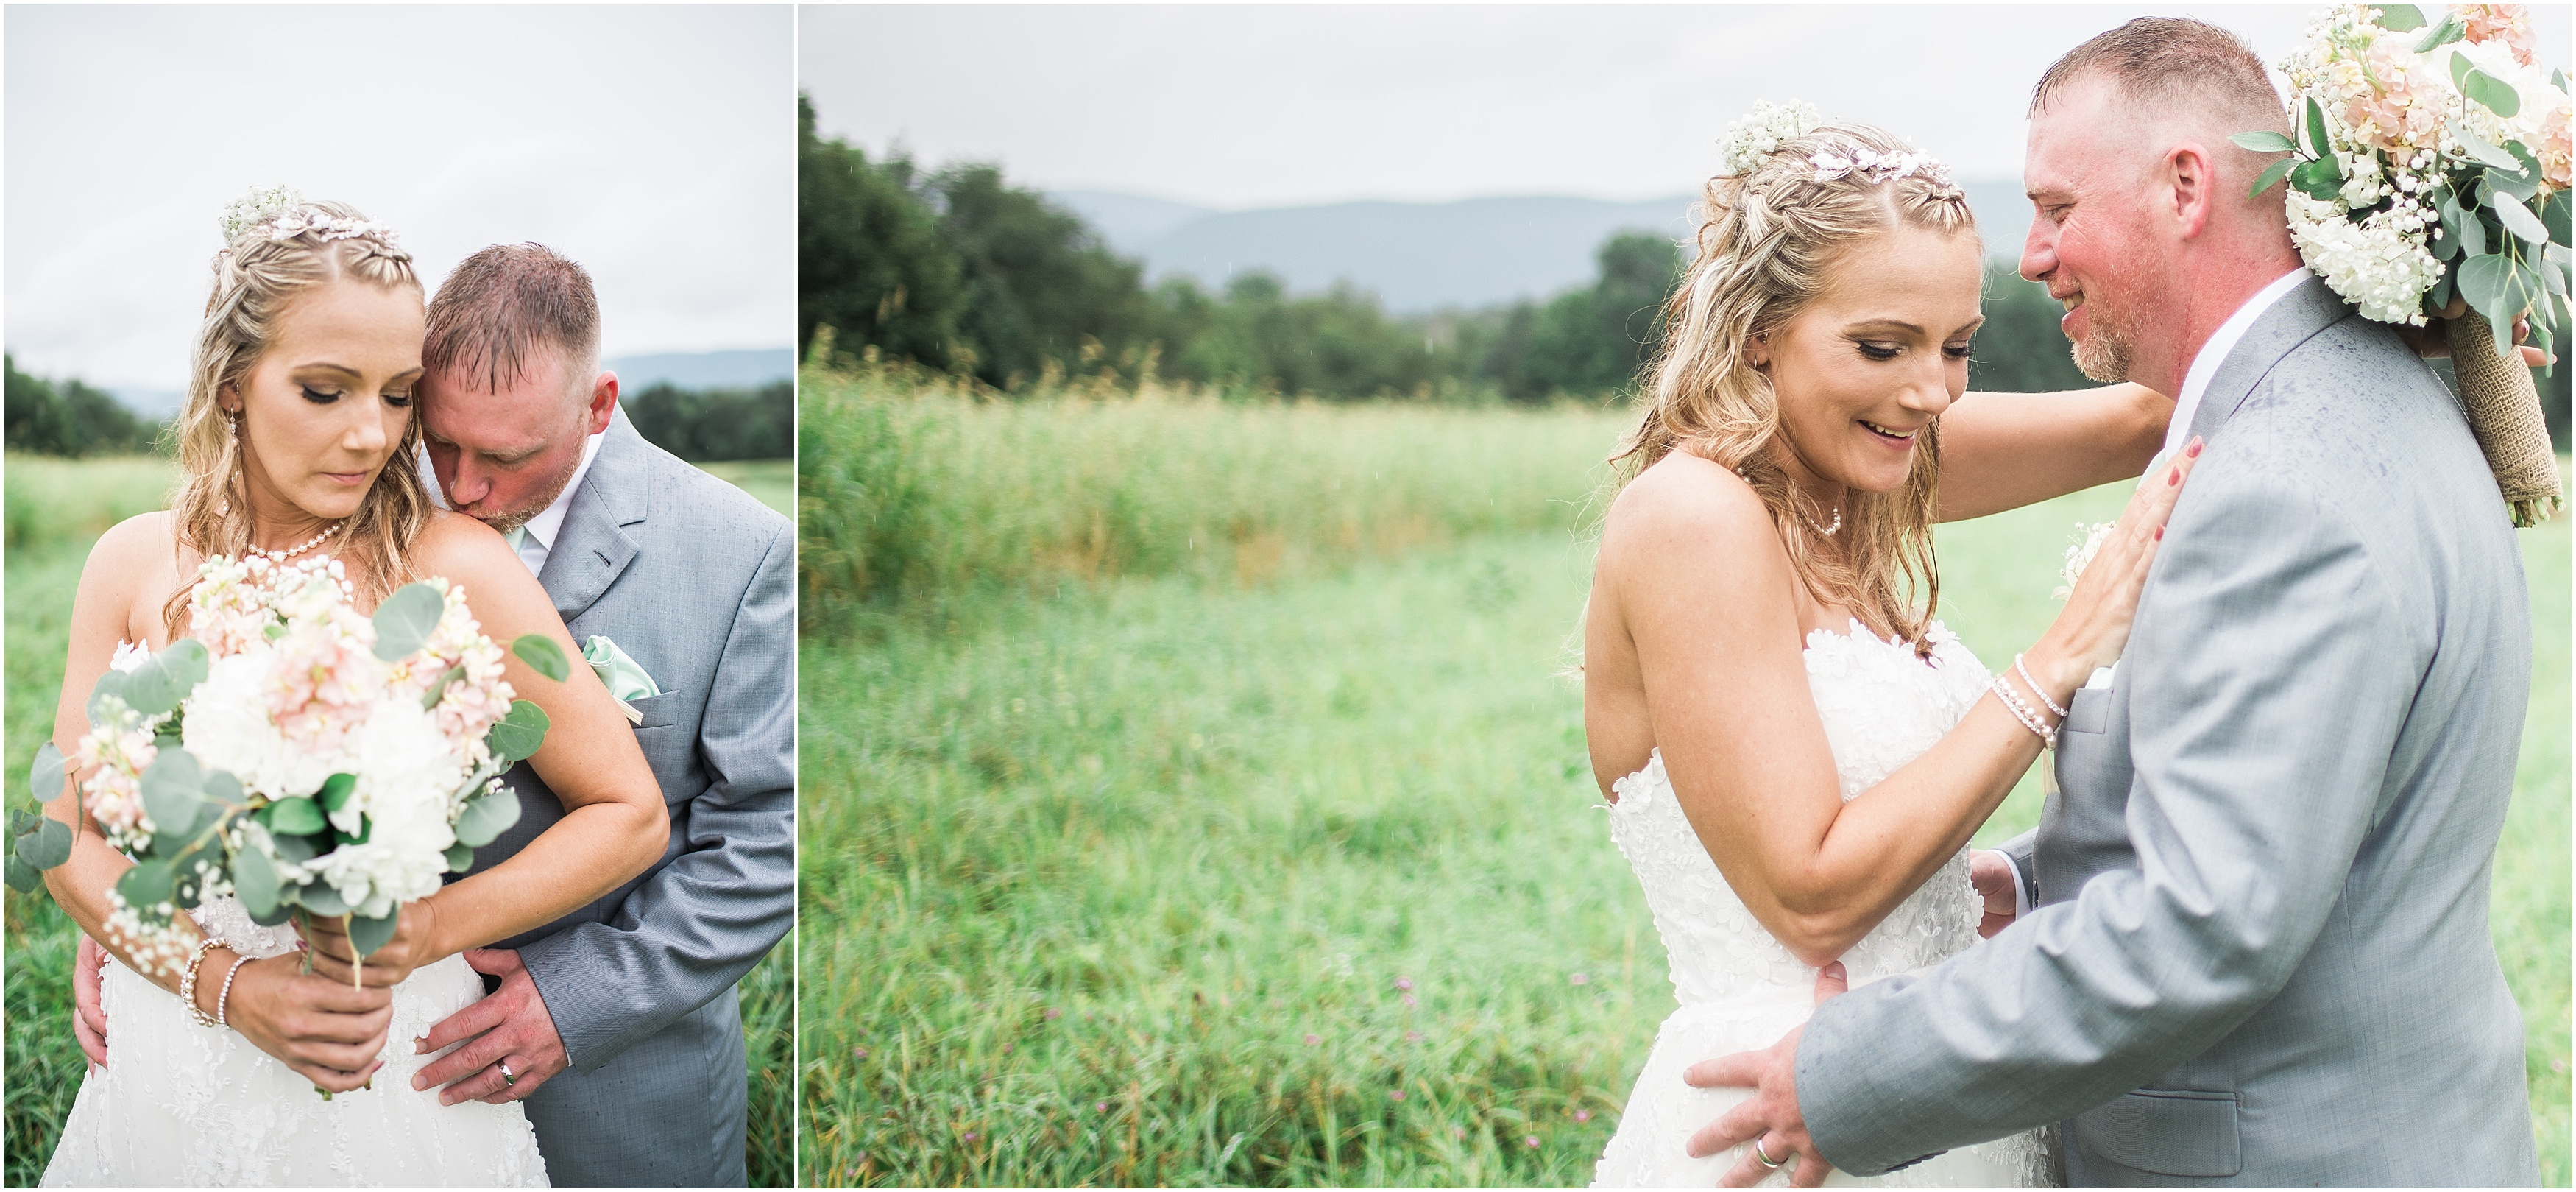 NEPA Wedding and Destination Photographer